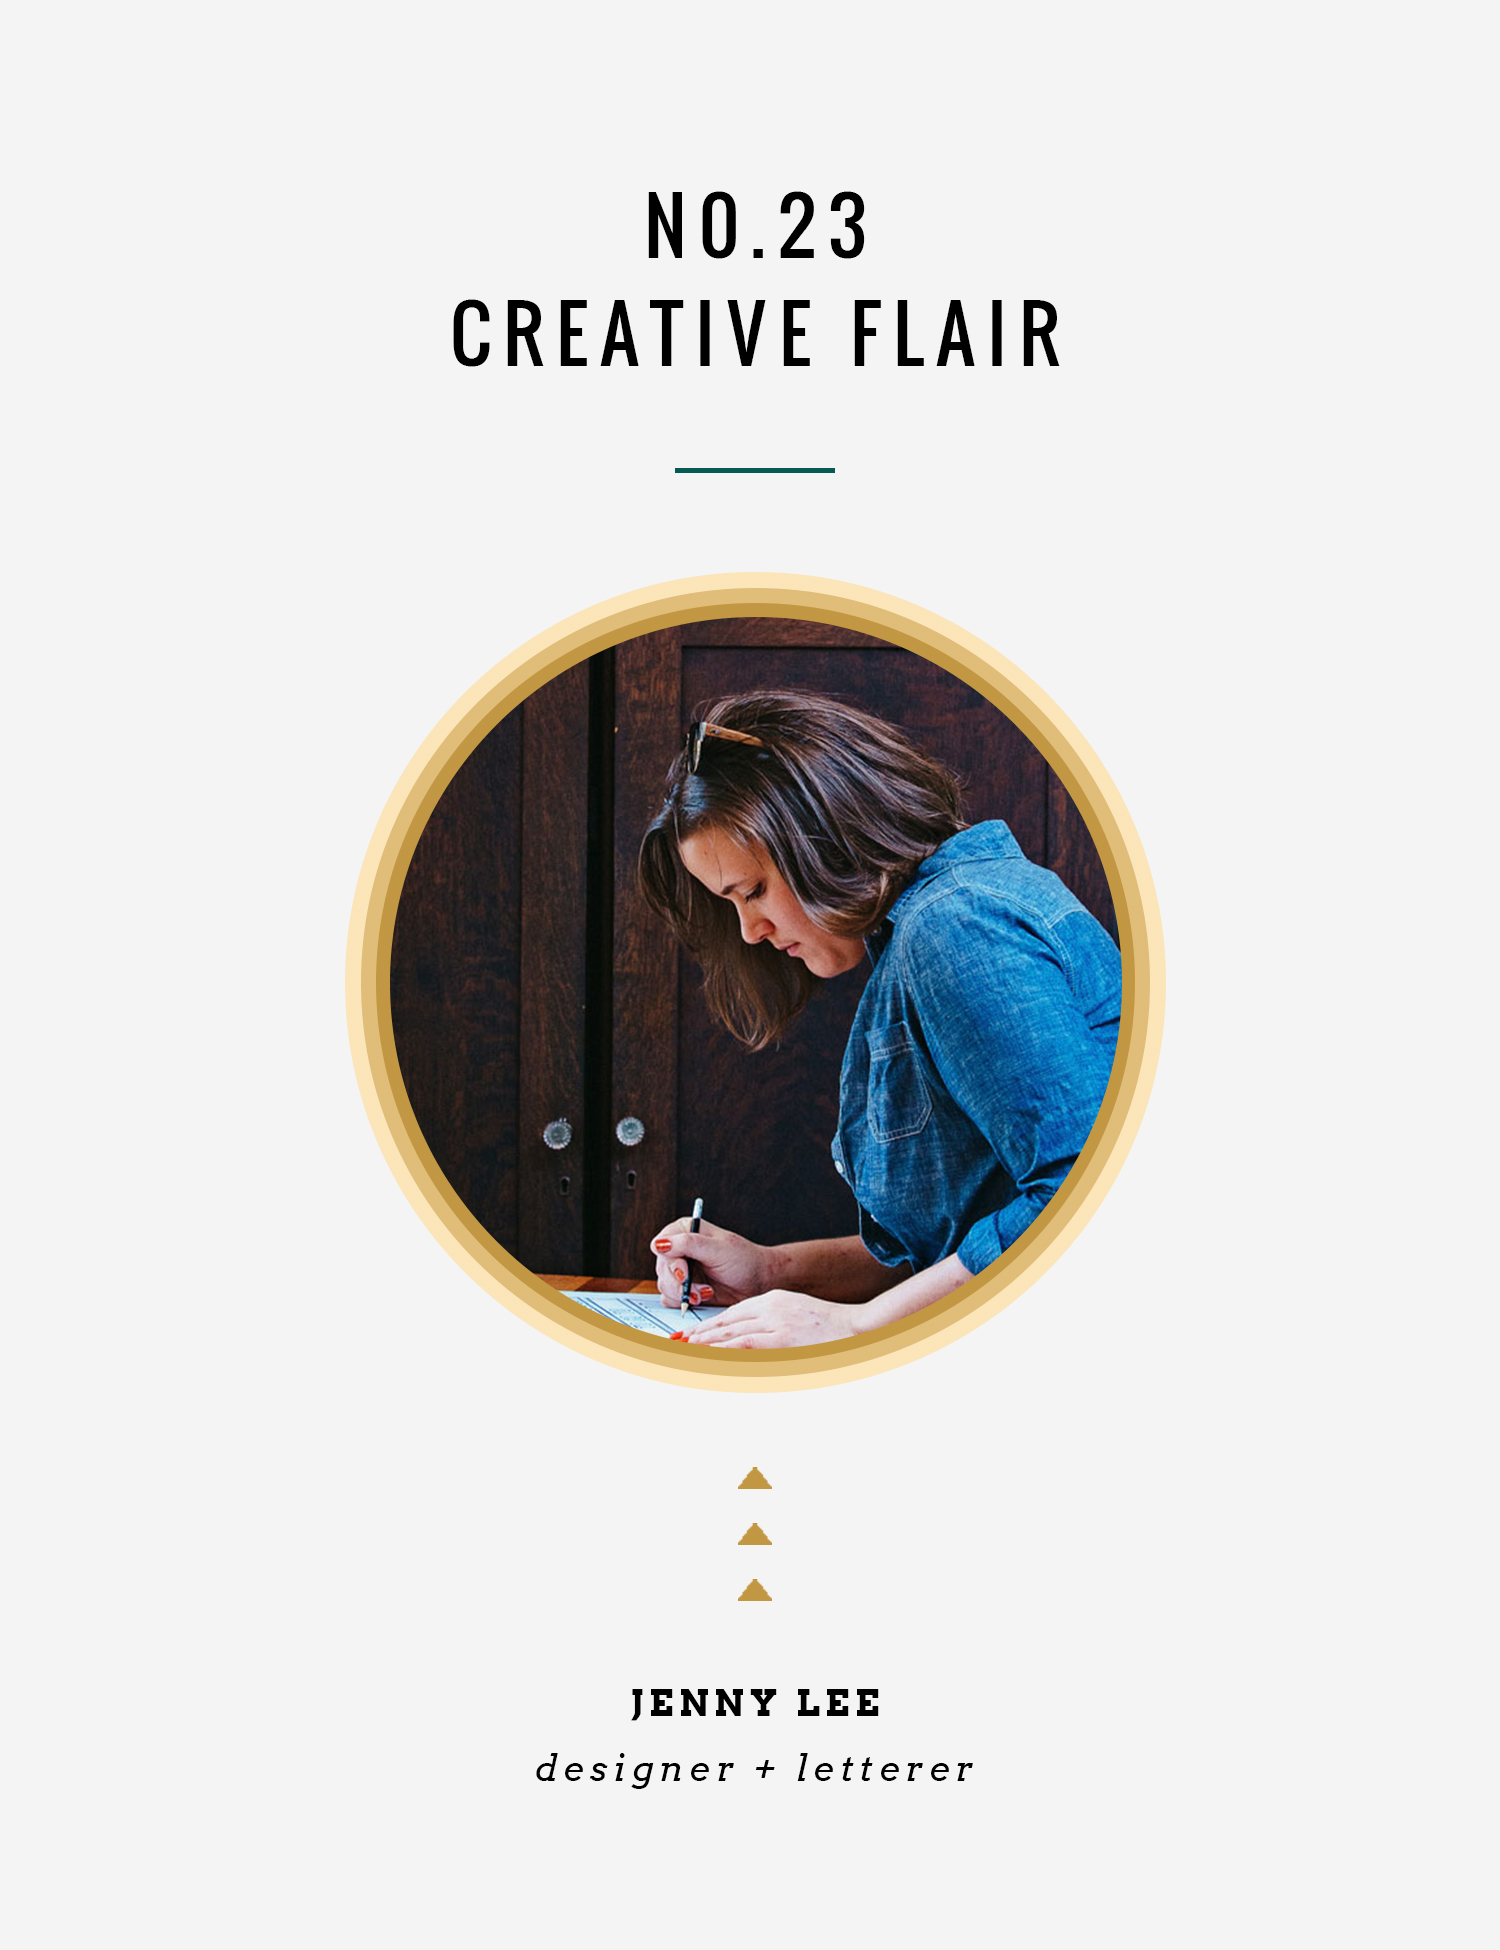 Creative Flair : Jenny Lee | InBetween the Curls